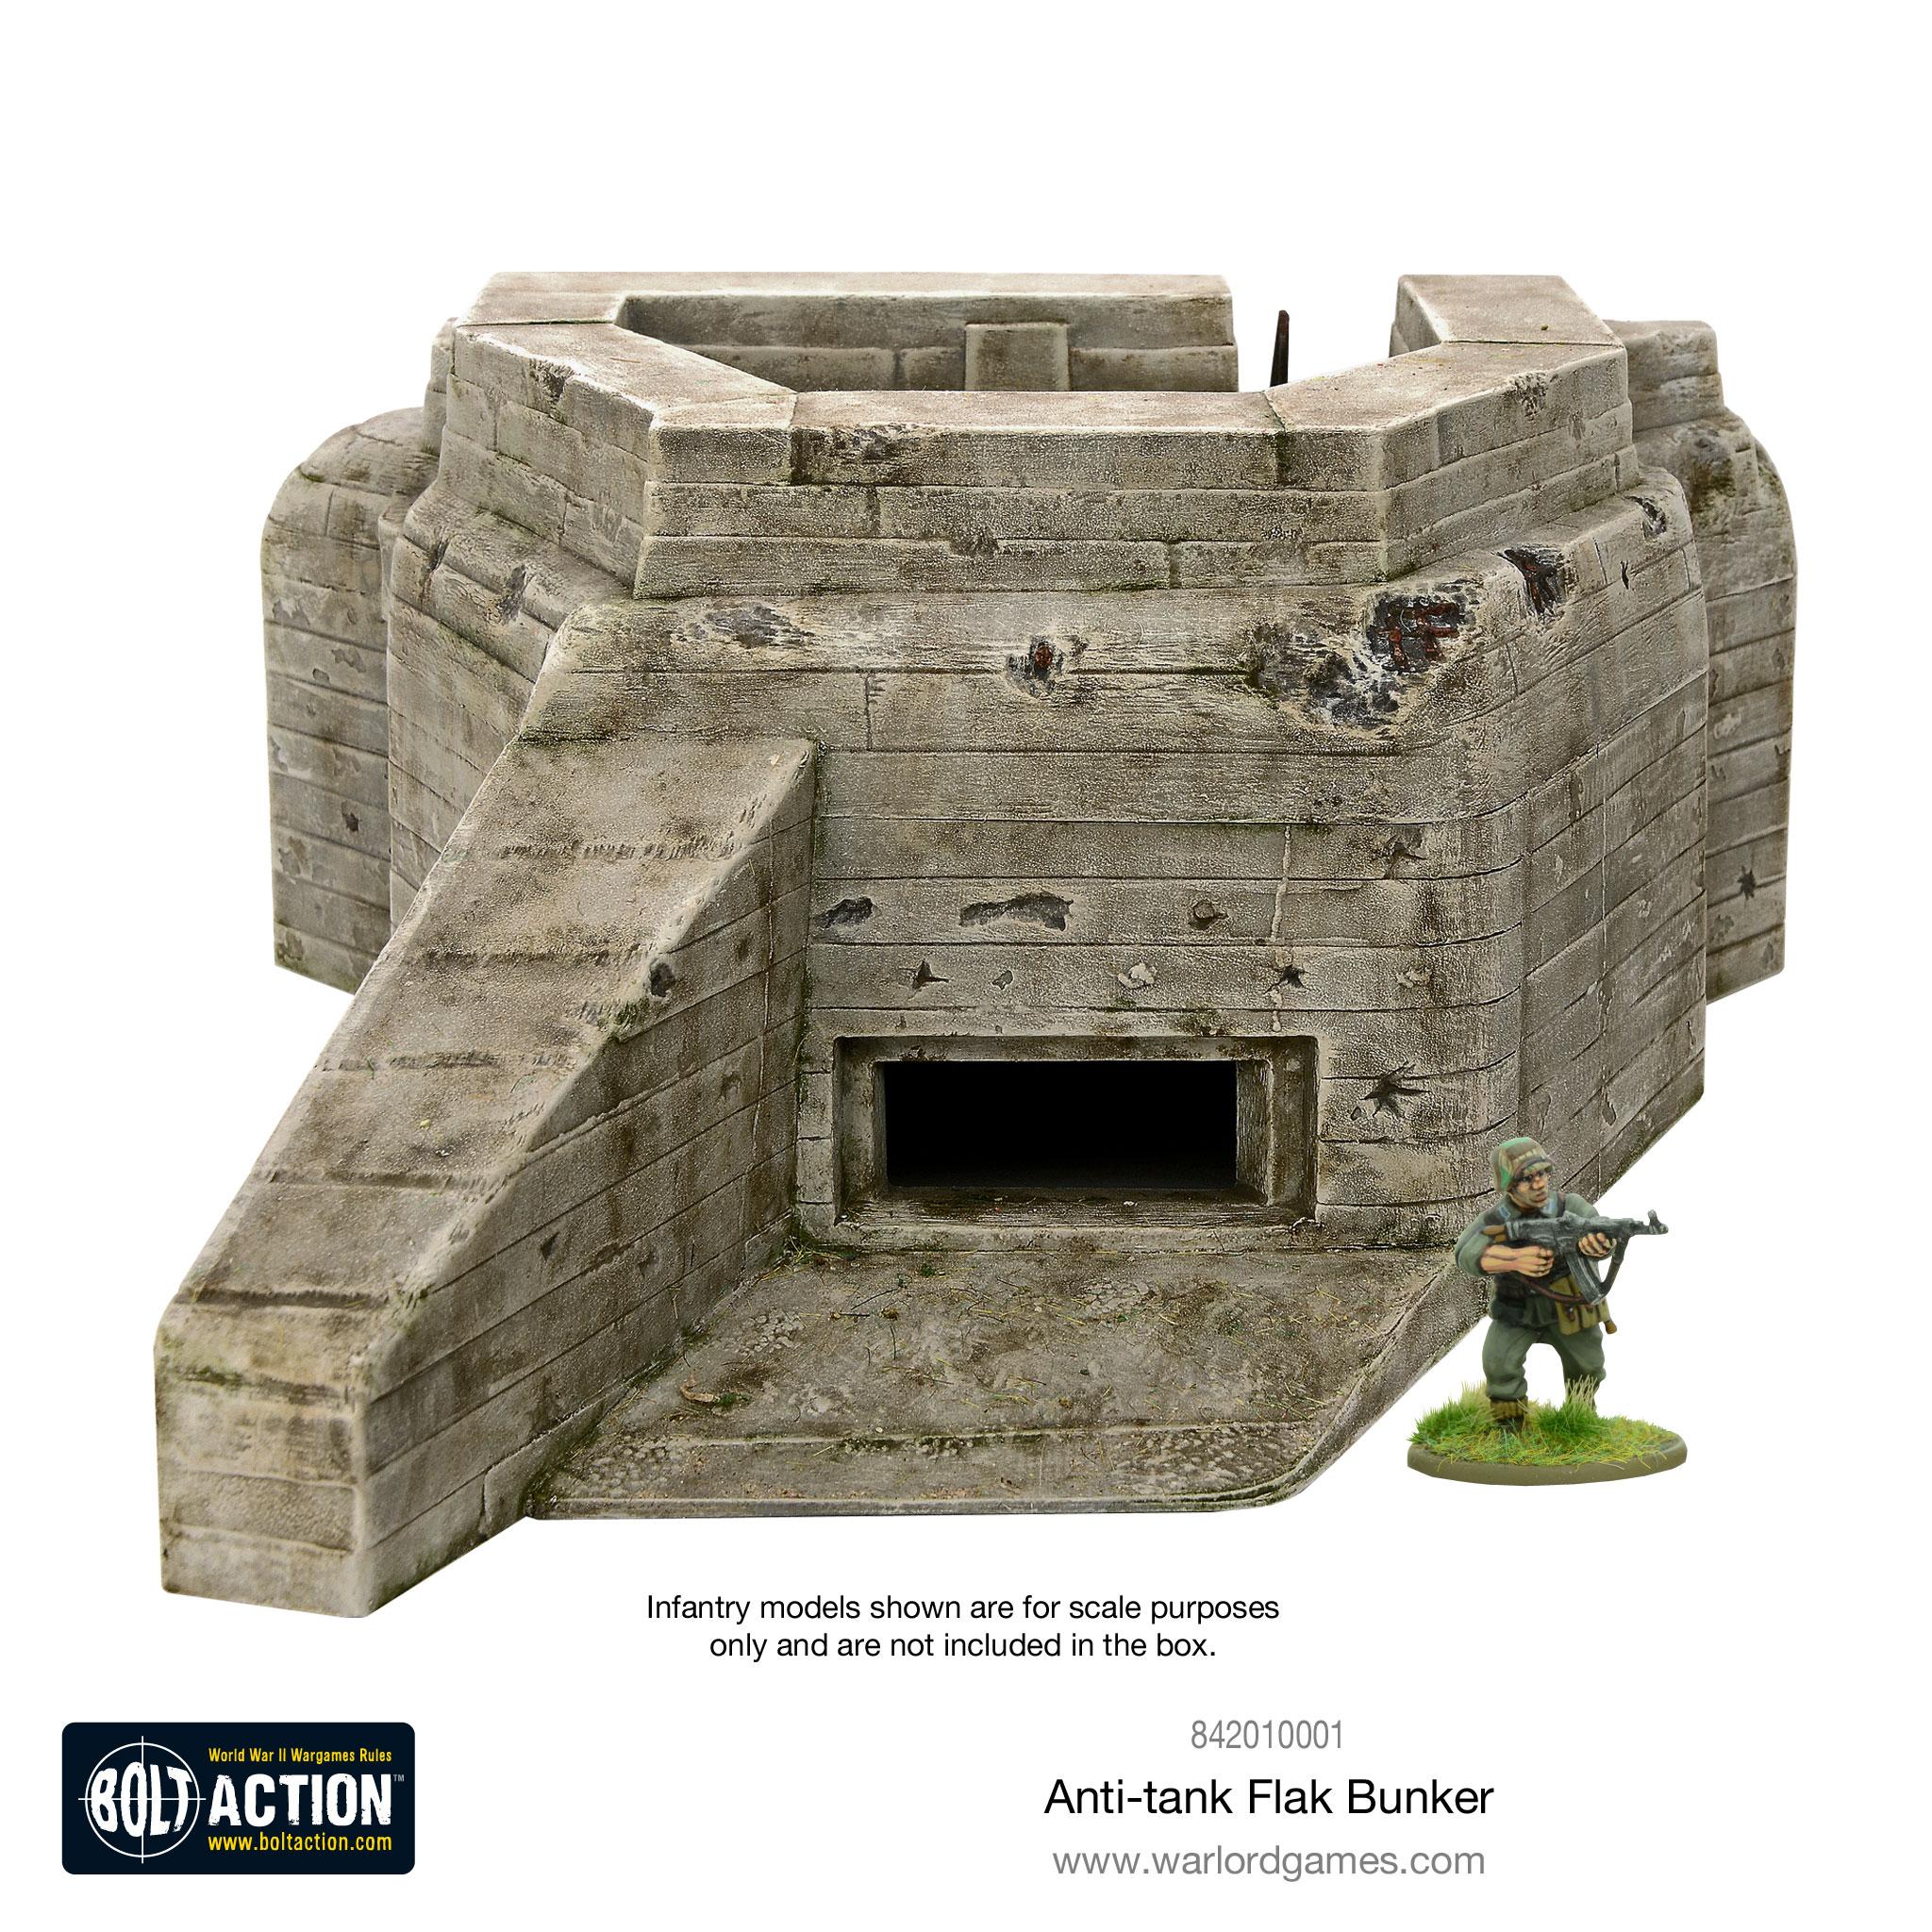 New: Flak Bunker - Plastic terrain - Warlord Games